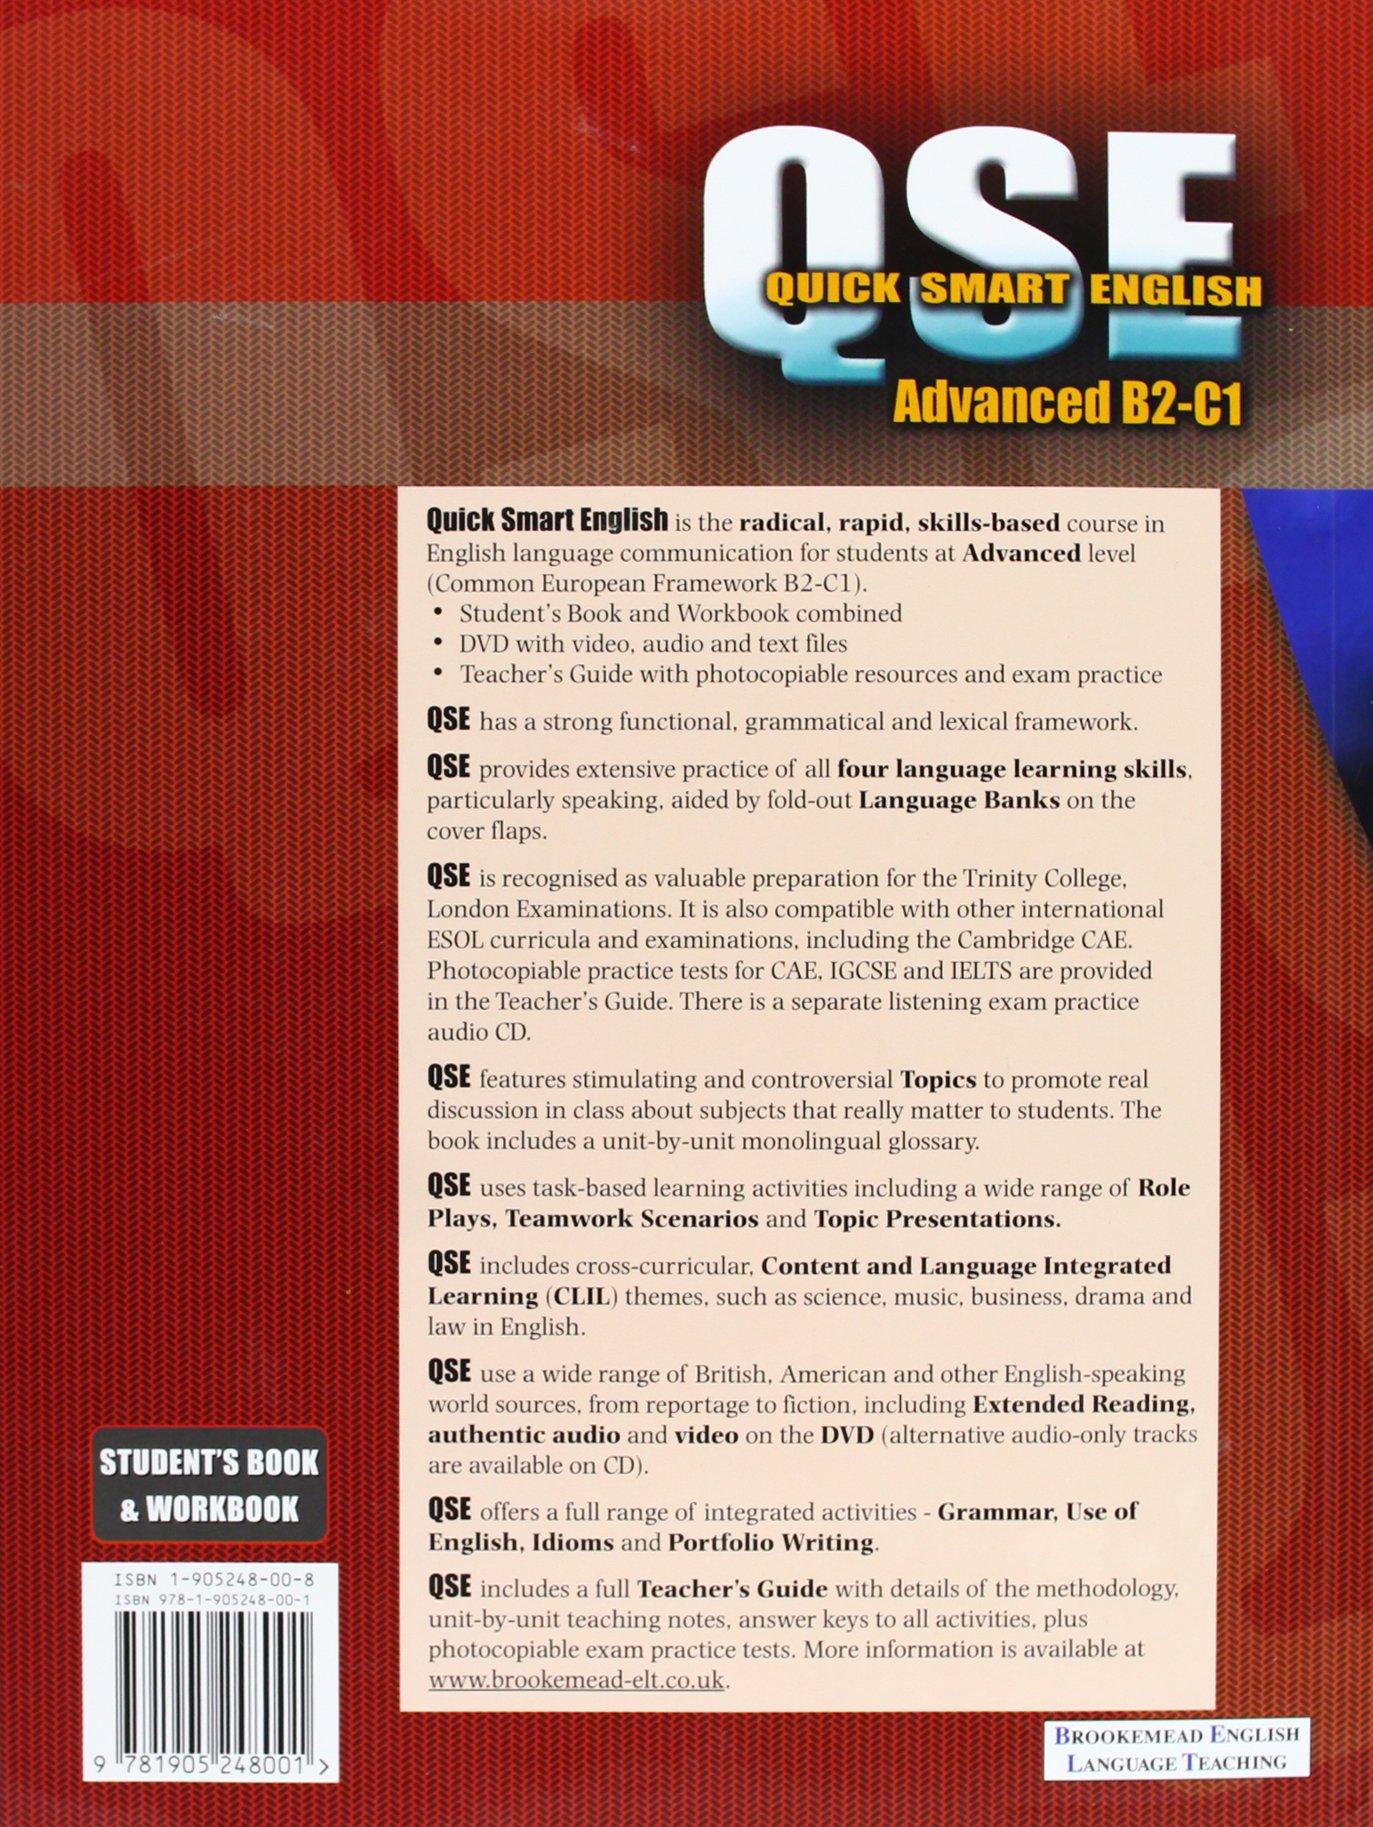 Quick Smart English B2-C1 (Advanced) Student Book & Workbook& DVD